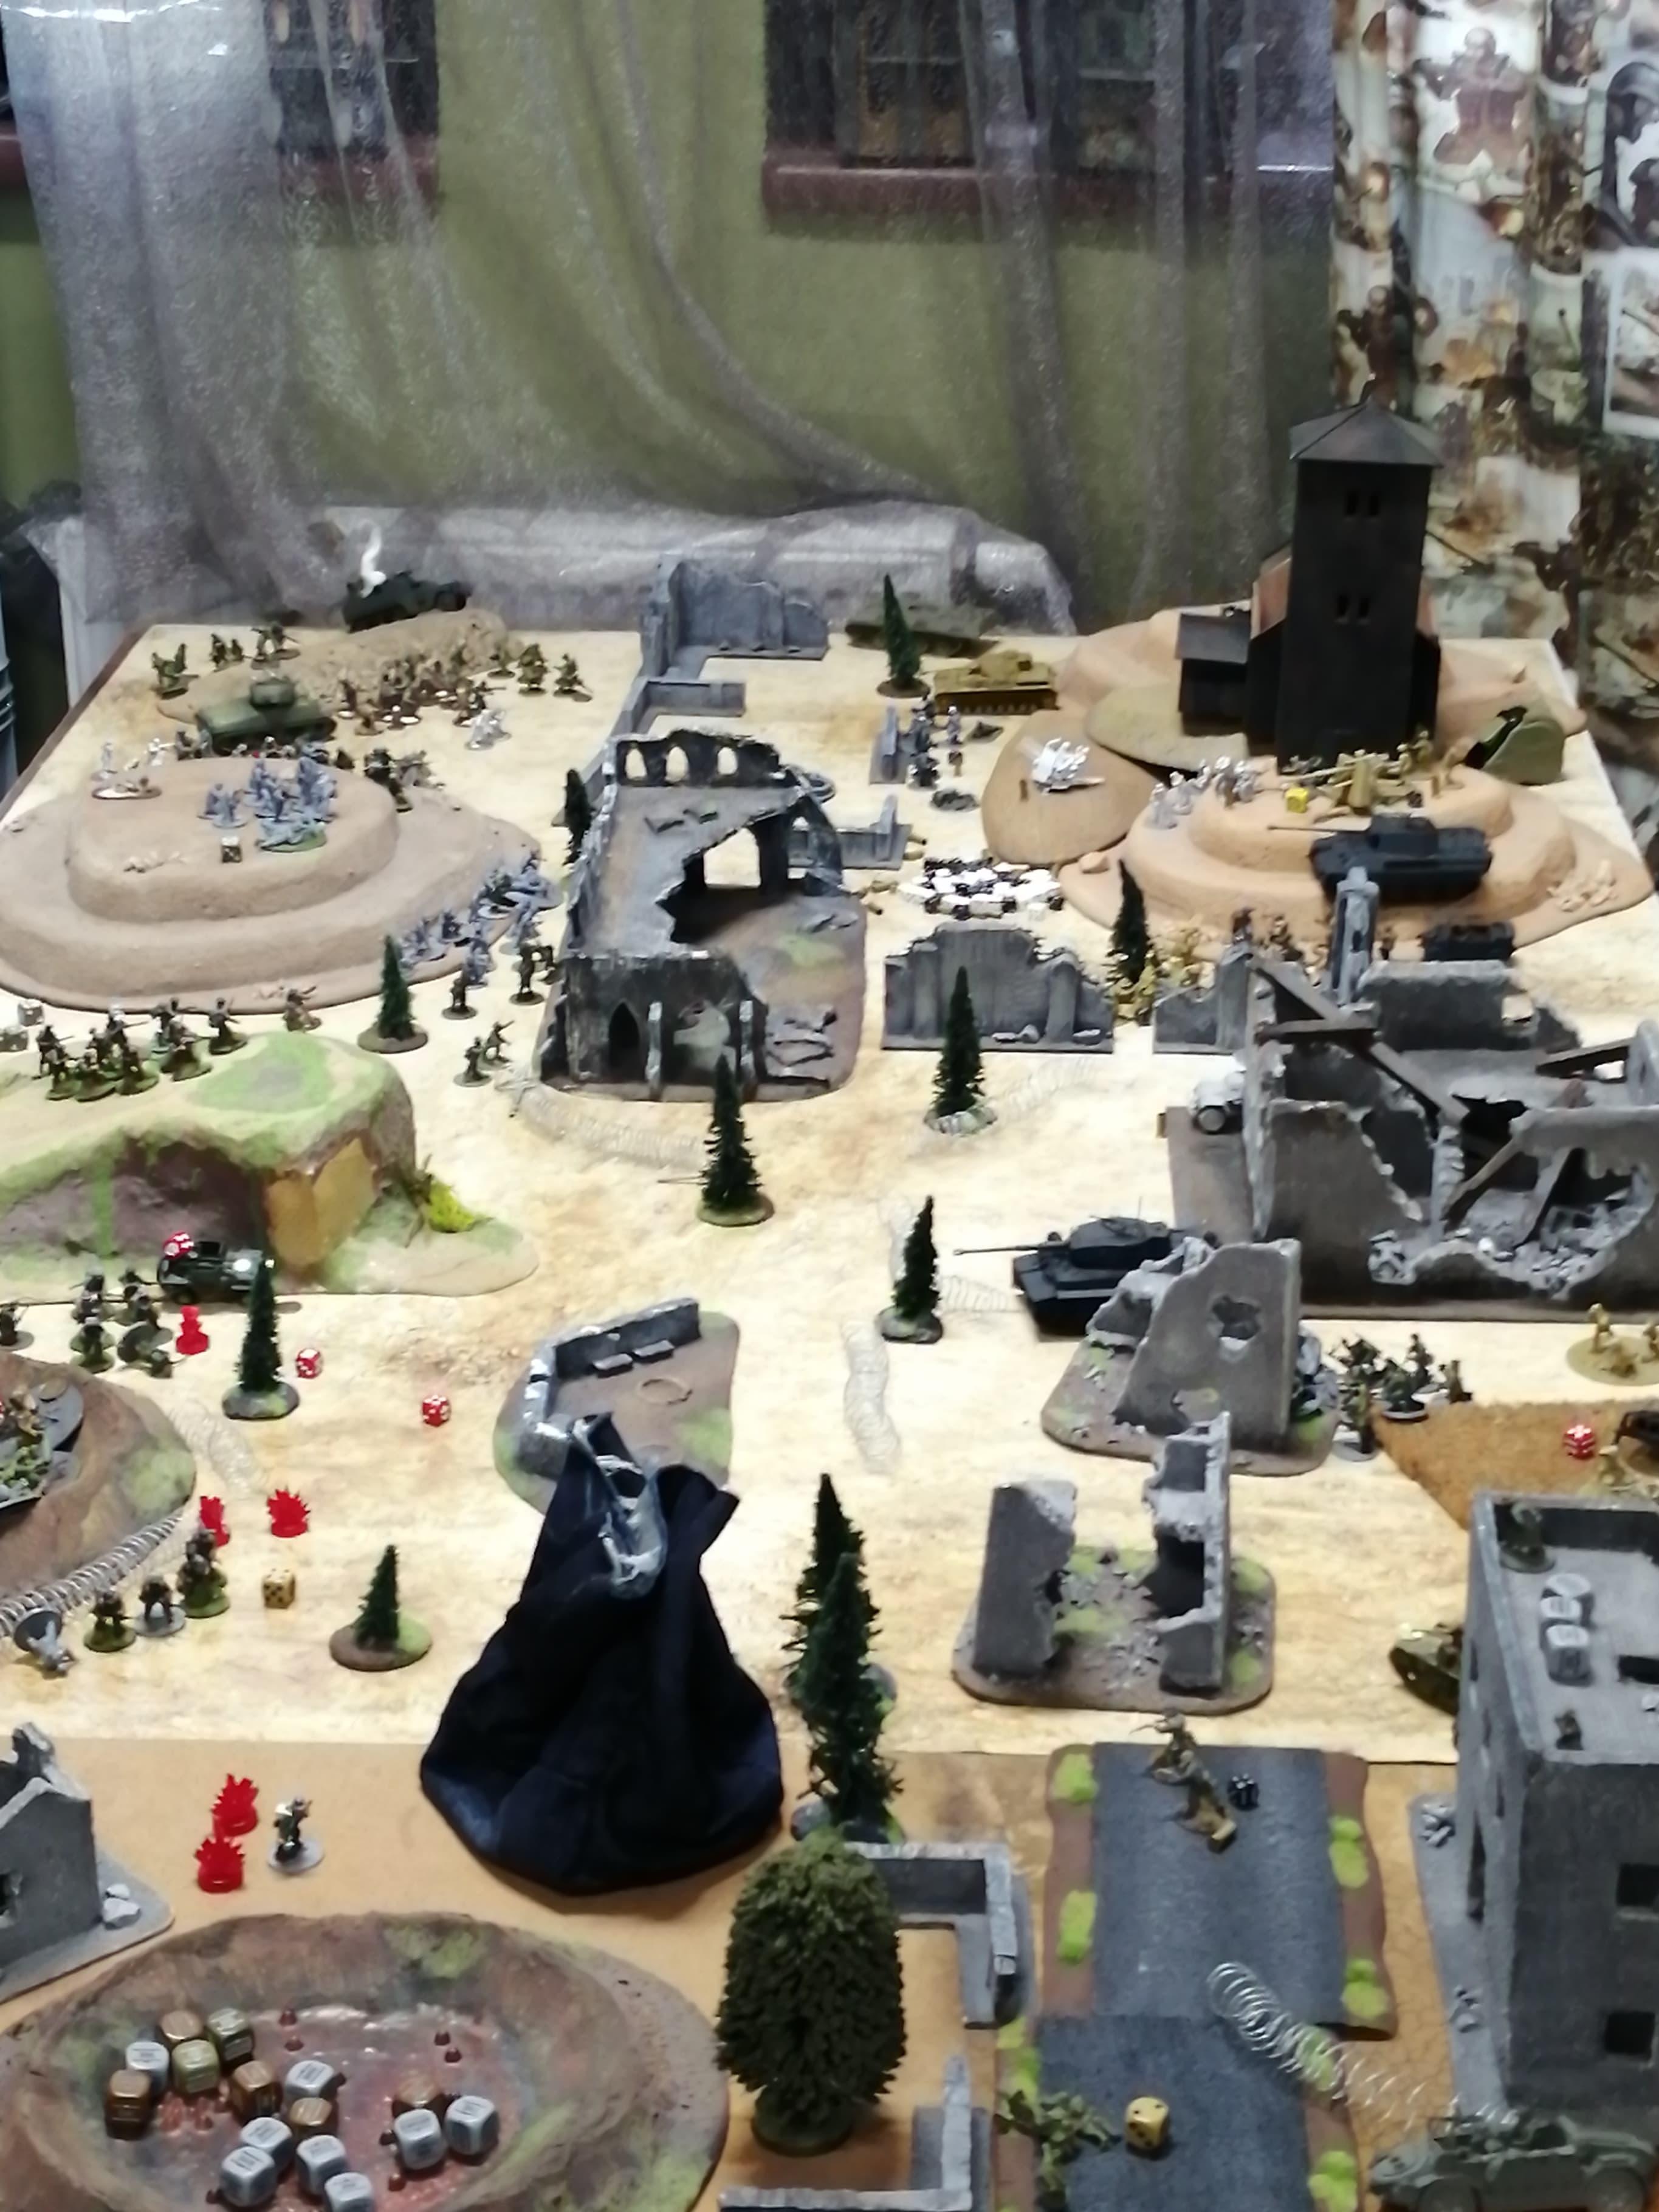 Regio XXI versus Hamburgers and tea lovers in a fierce infantry engagement